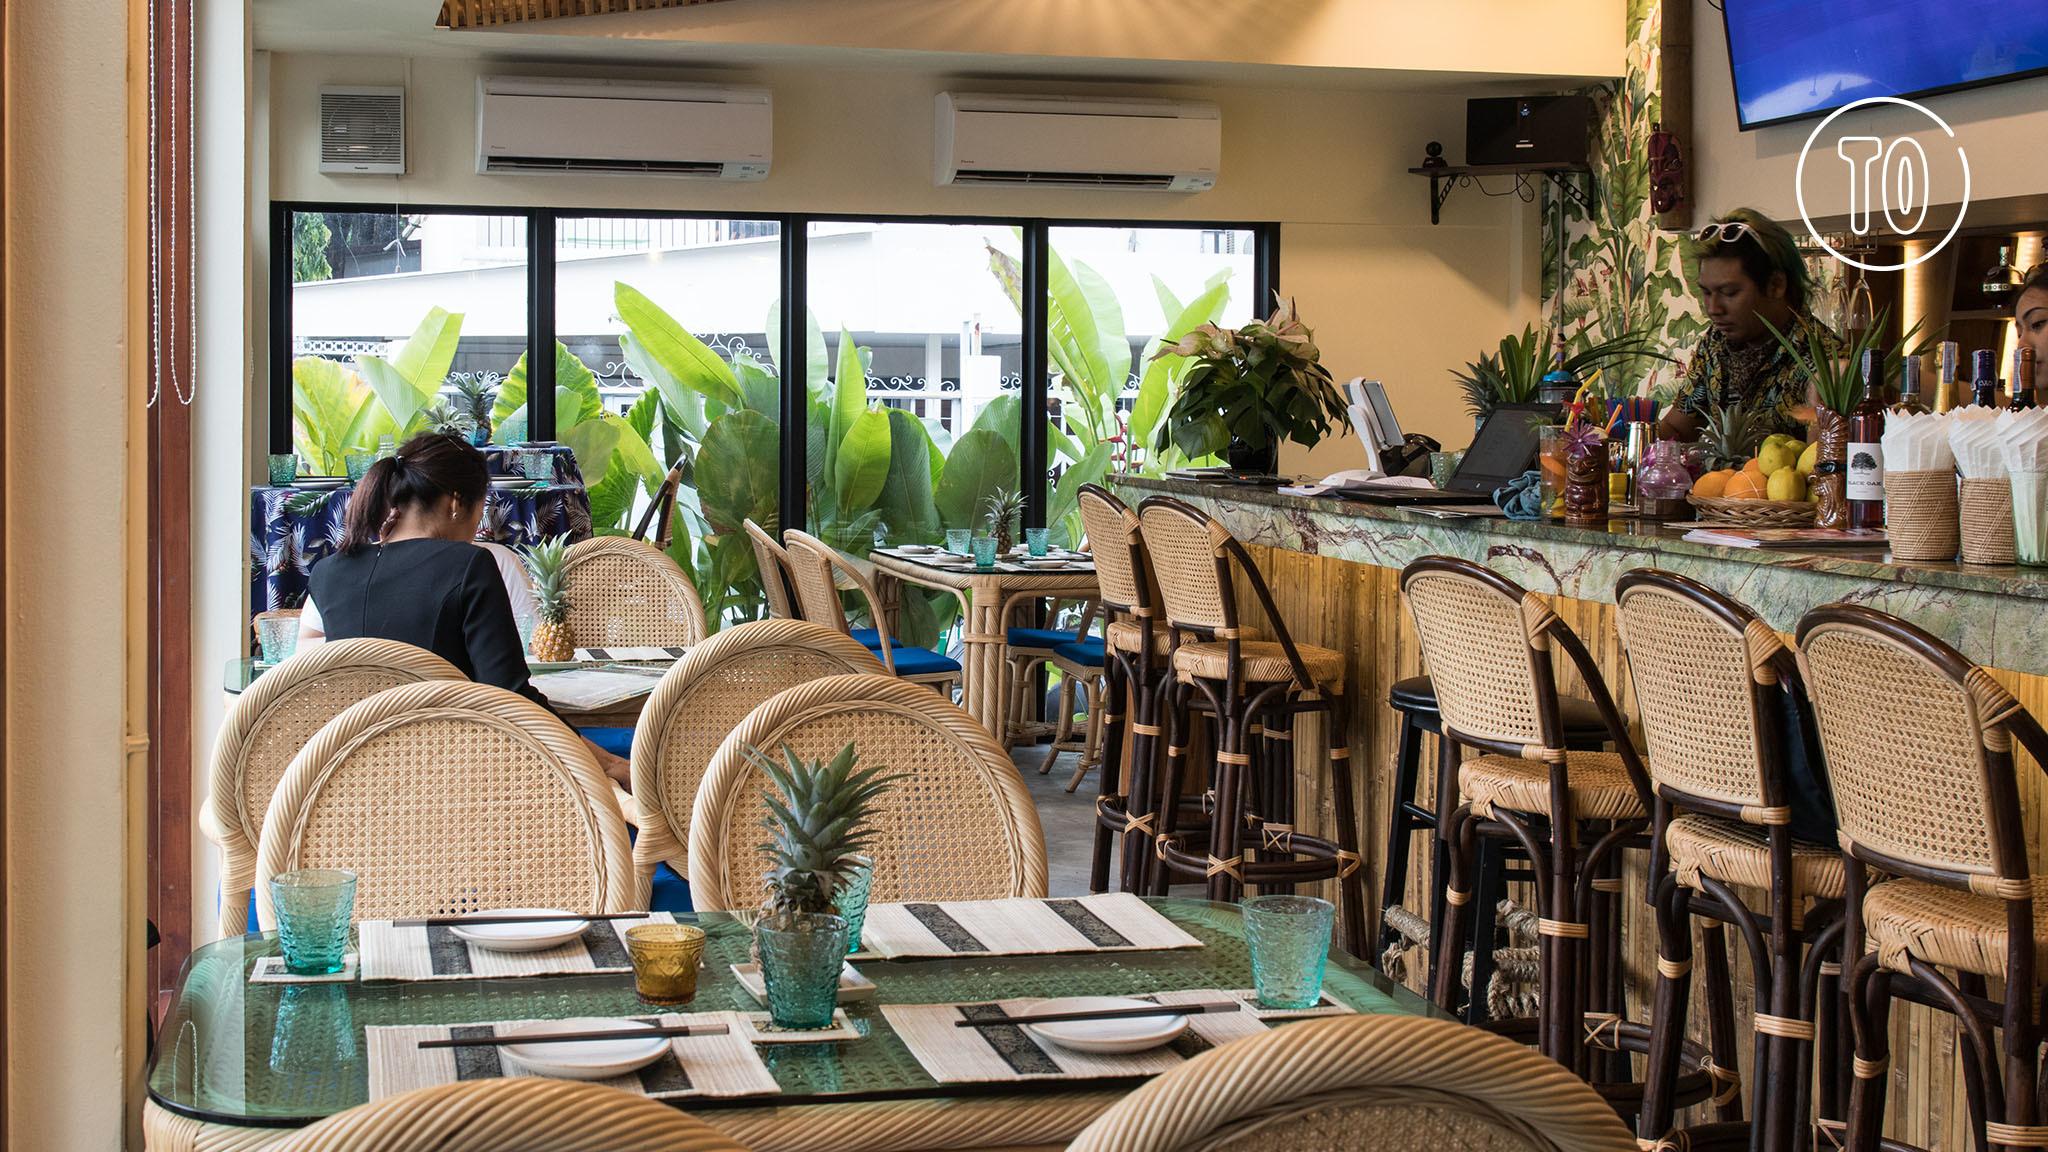 Pakalolo, the new Hawaiian-themed bar in Ari